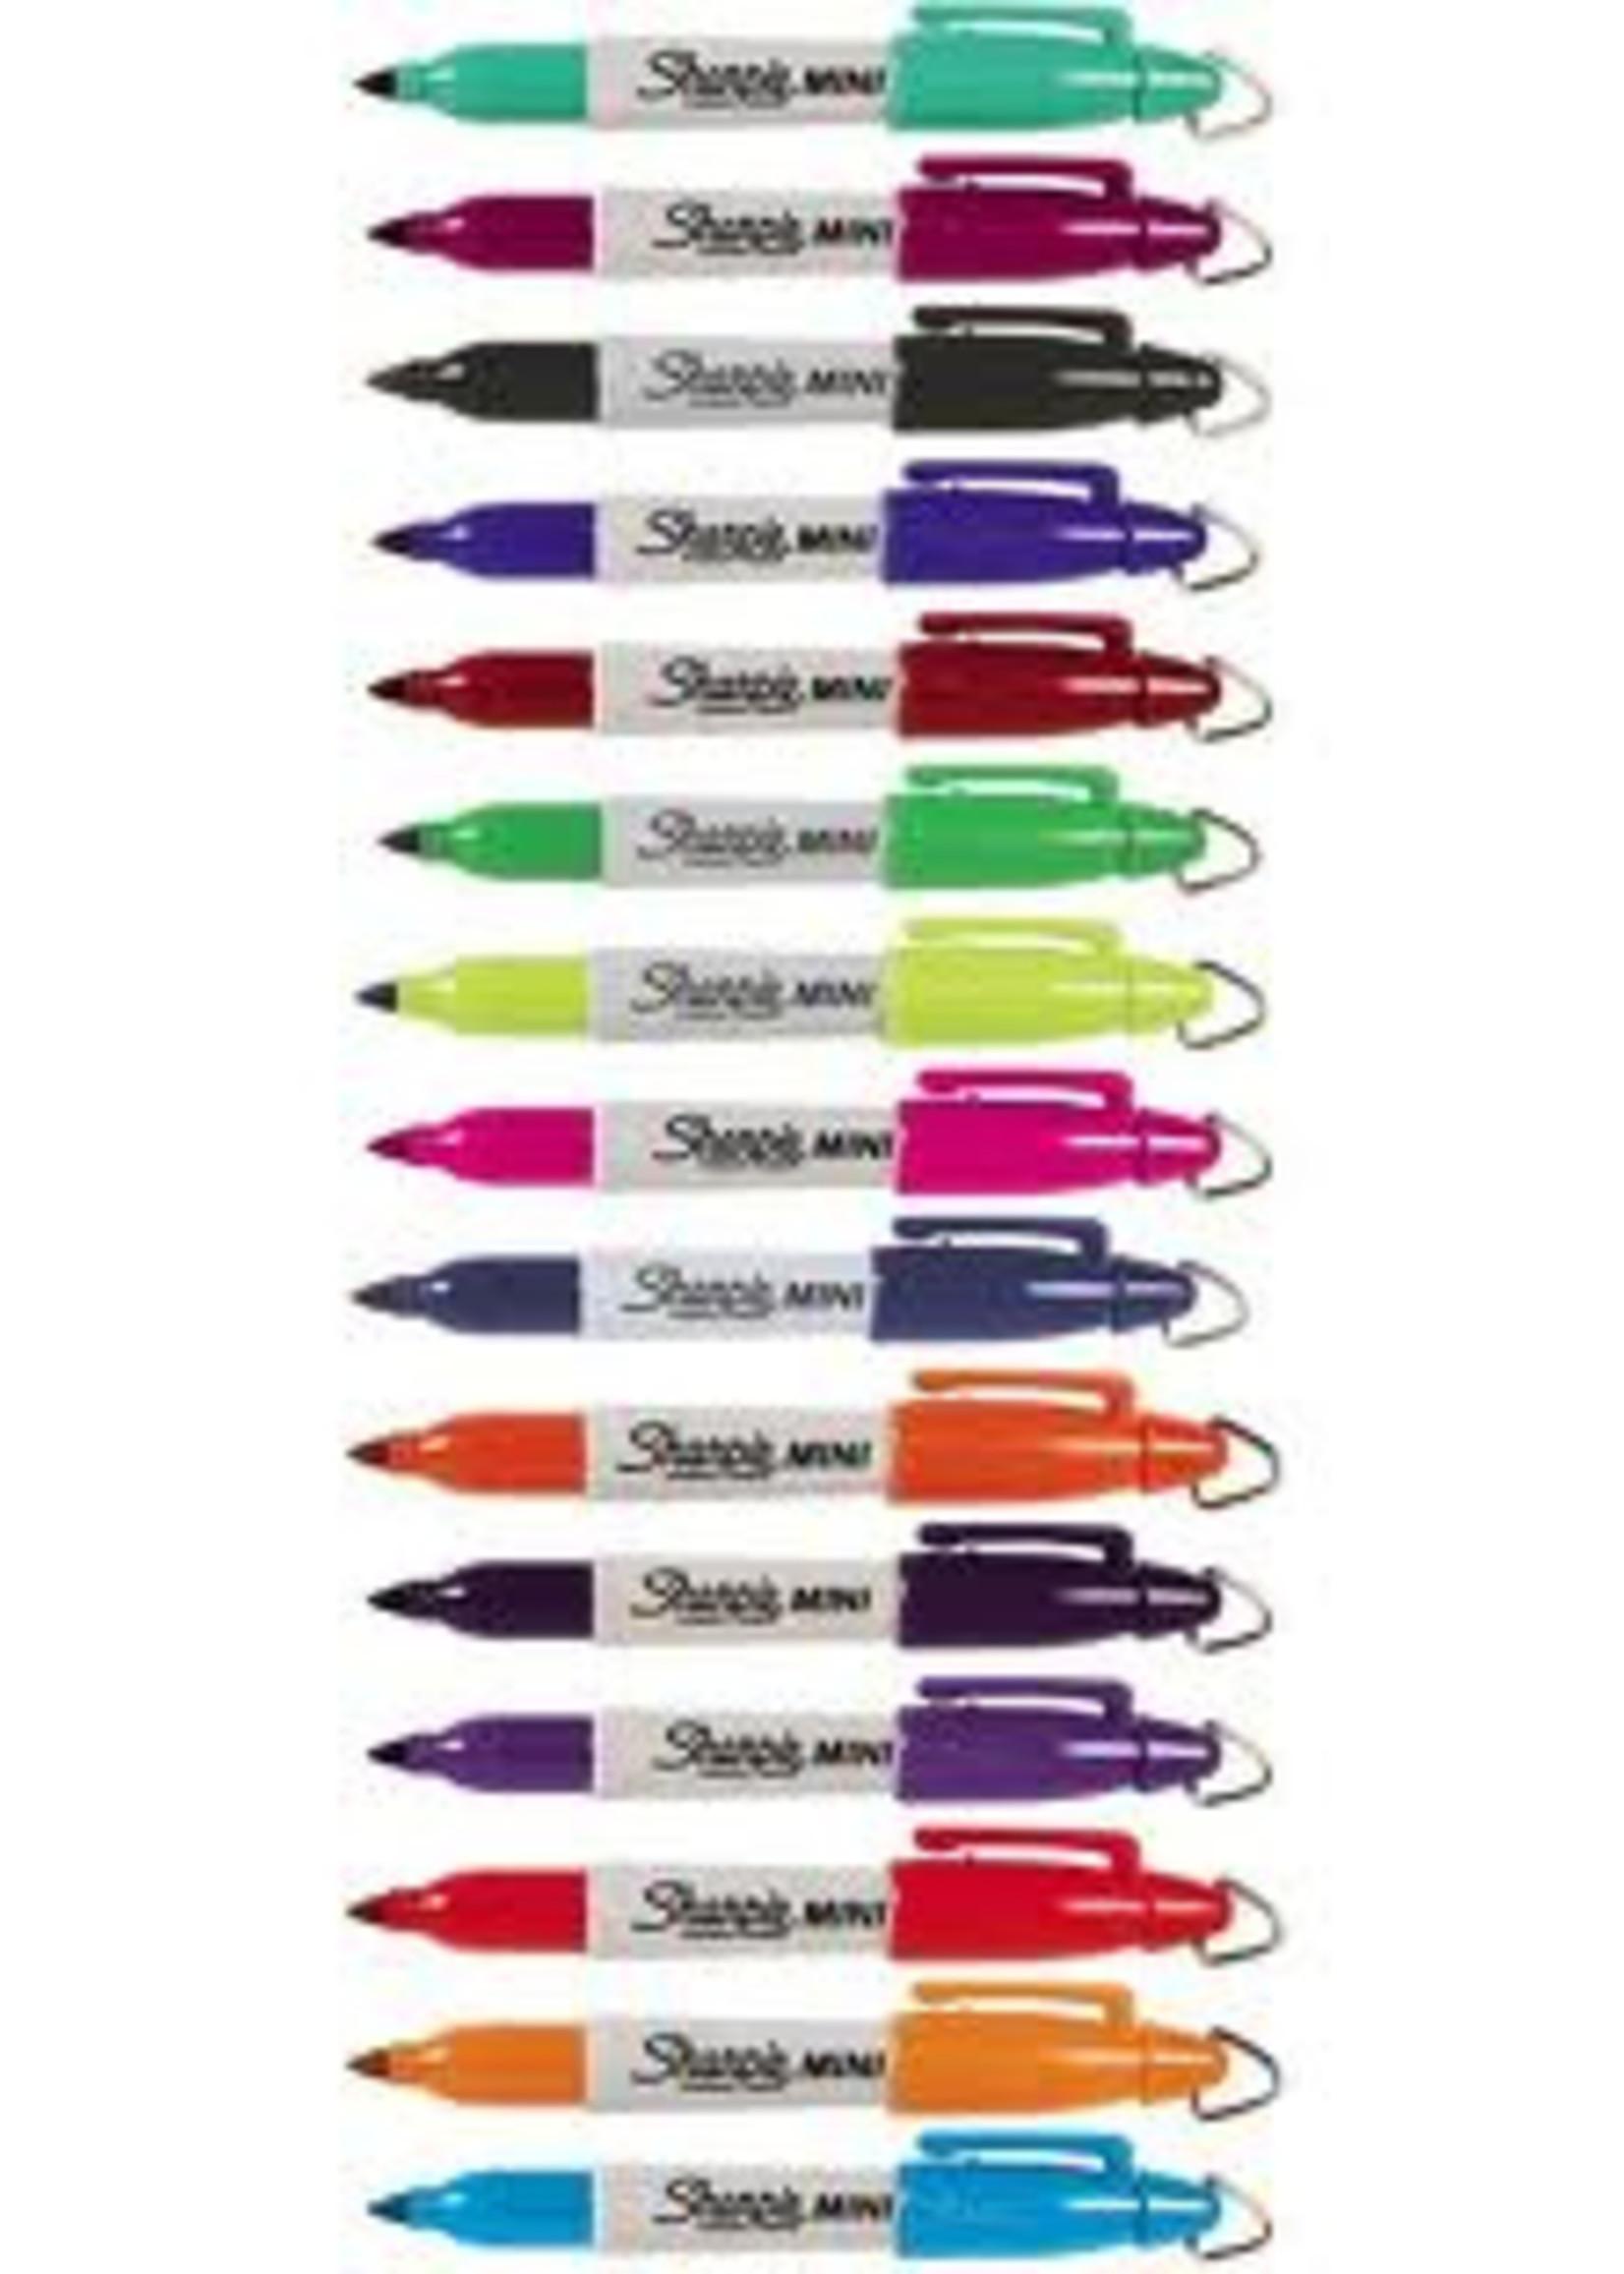 Sharpie Sharpie Mini Permanent Marker